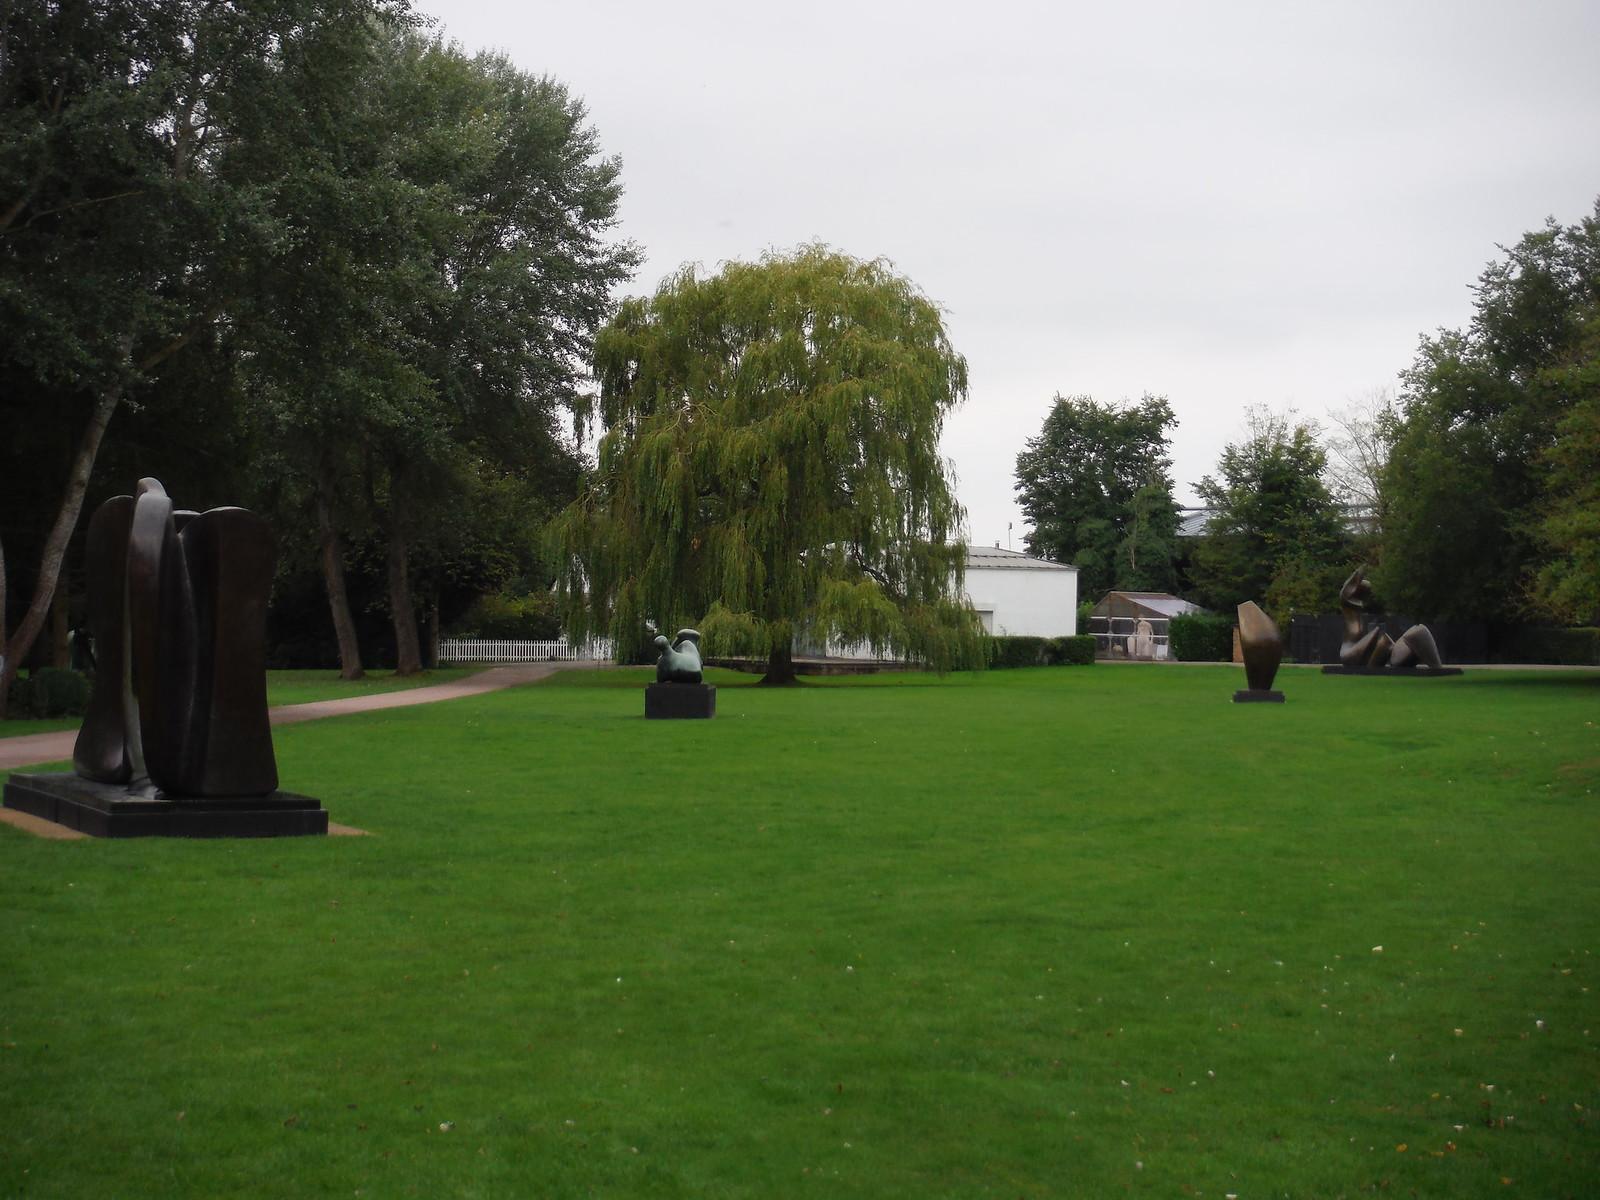 Hoglands, Garden Lawn SWC Walk 164 Roydon to Sawbridgeworth via Henry Moore Foundation